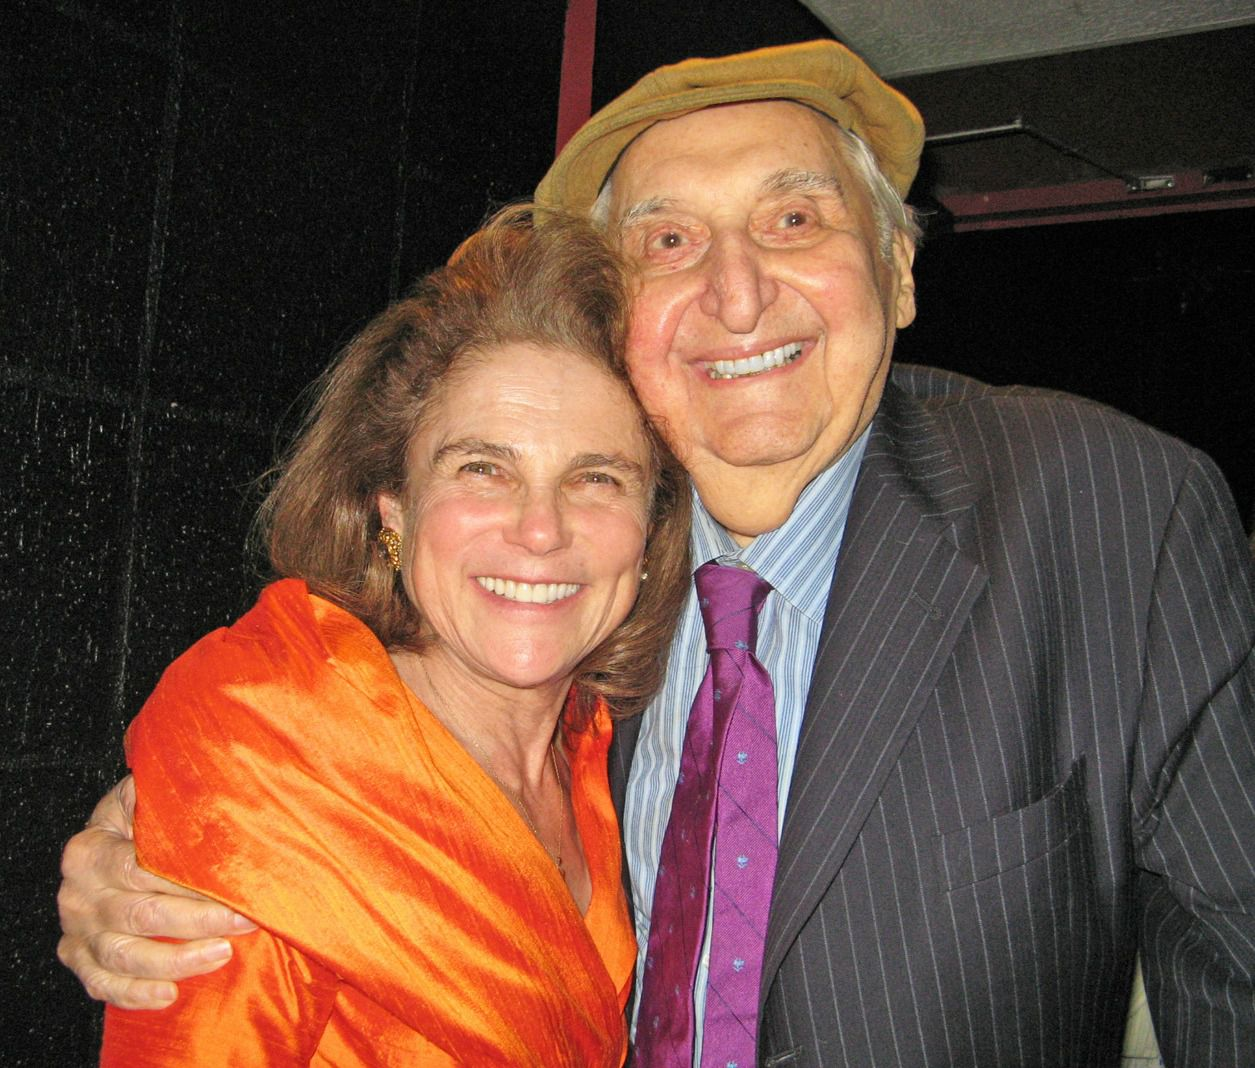 Tovah Feldshuh and Fyvush Finkel